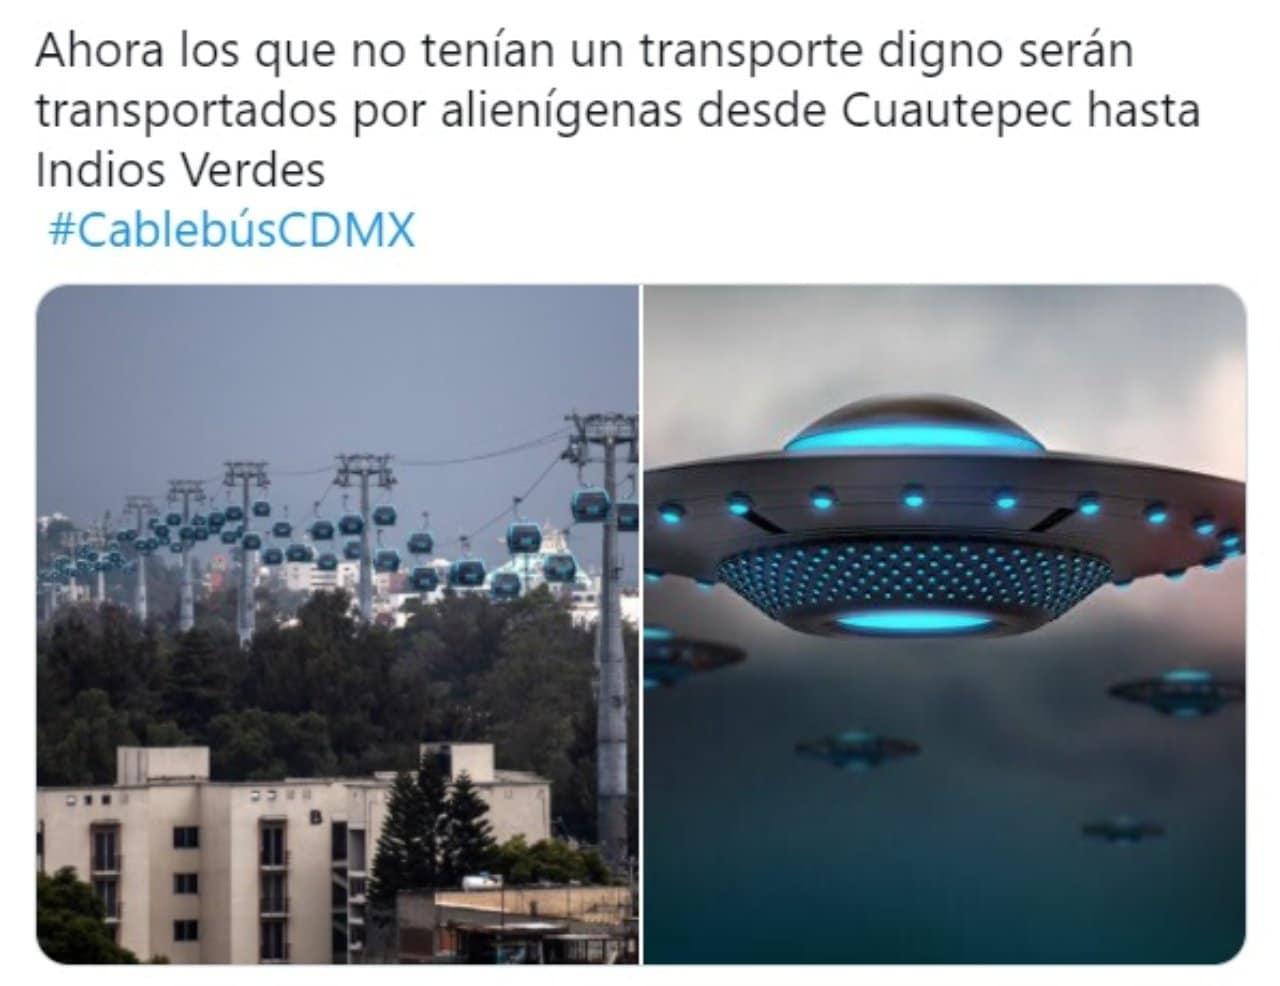 Meme cablebus transporte alienigena